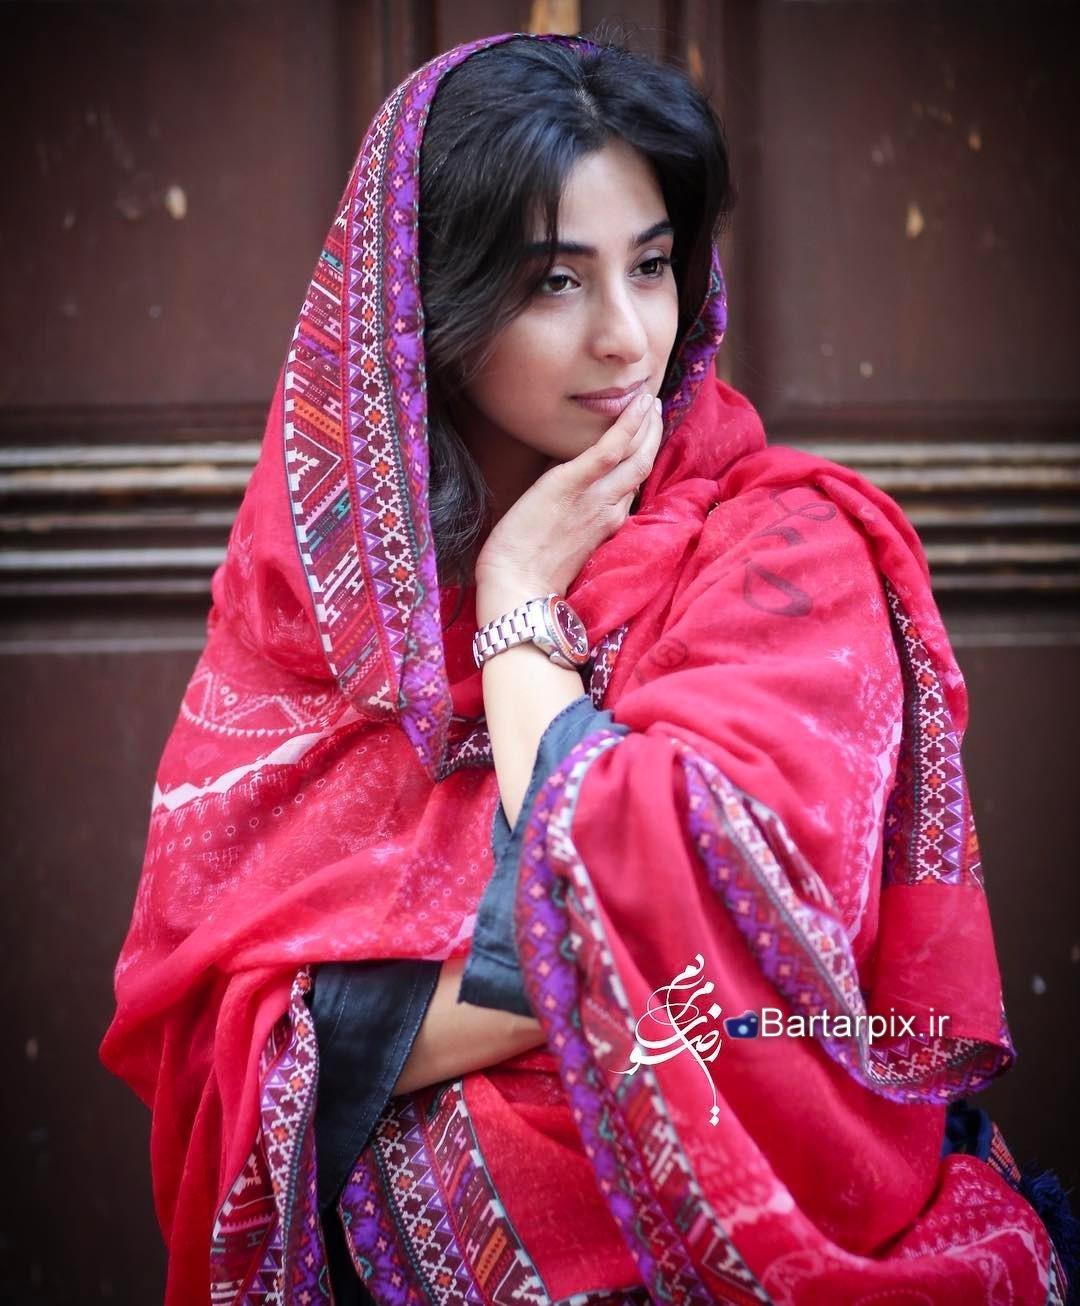 http://s8.picofile.com/file/8295201192/www_bartarpix_ir_anahita_afshar_sal_1396.jpg